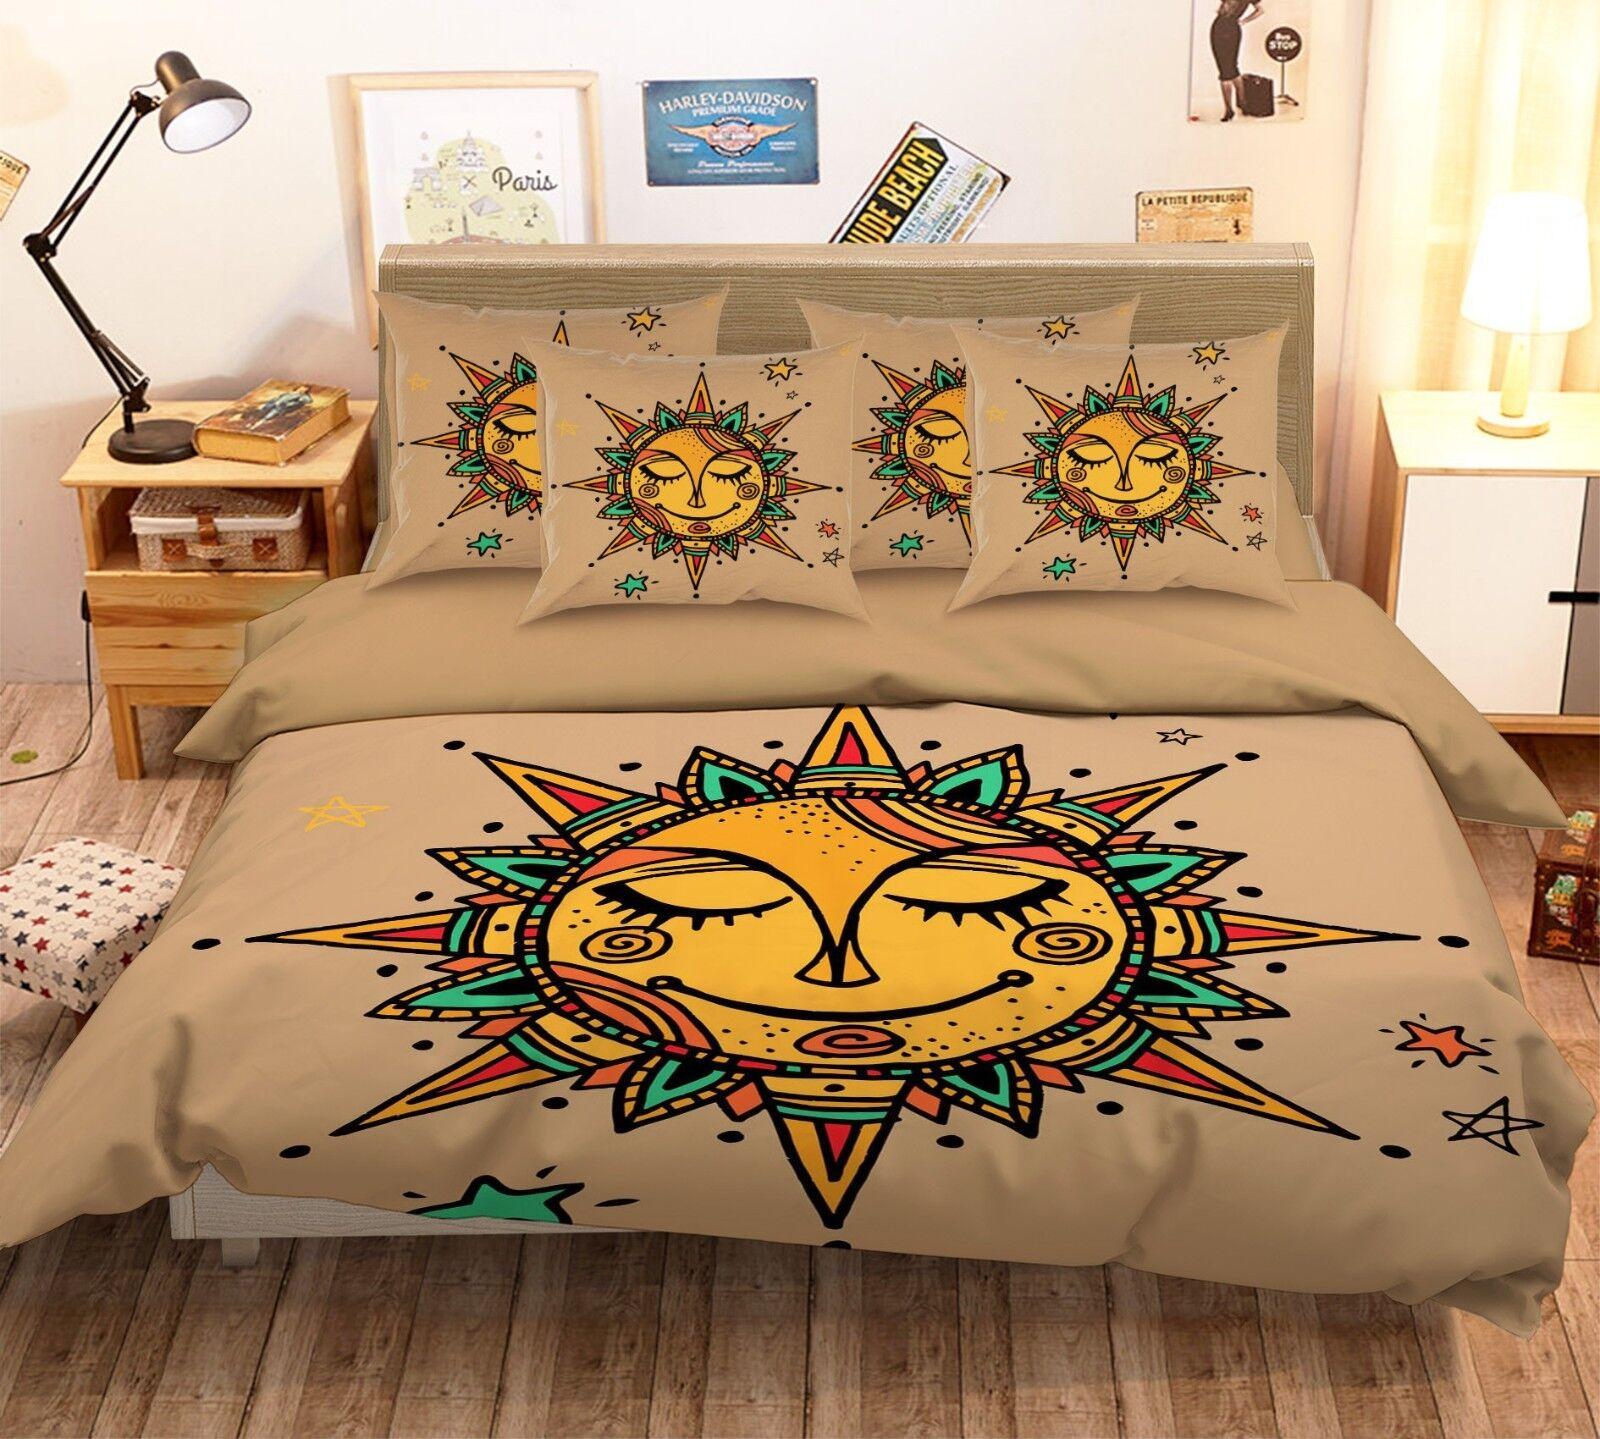 3D Sun God 4 Bed Pillowcases Quilt Duvet Cover Set Single Queen King AU Cobb